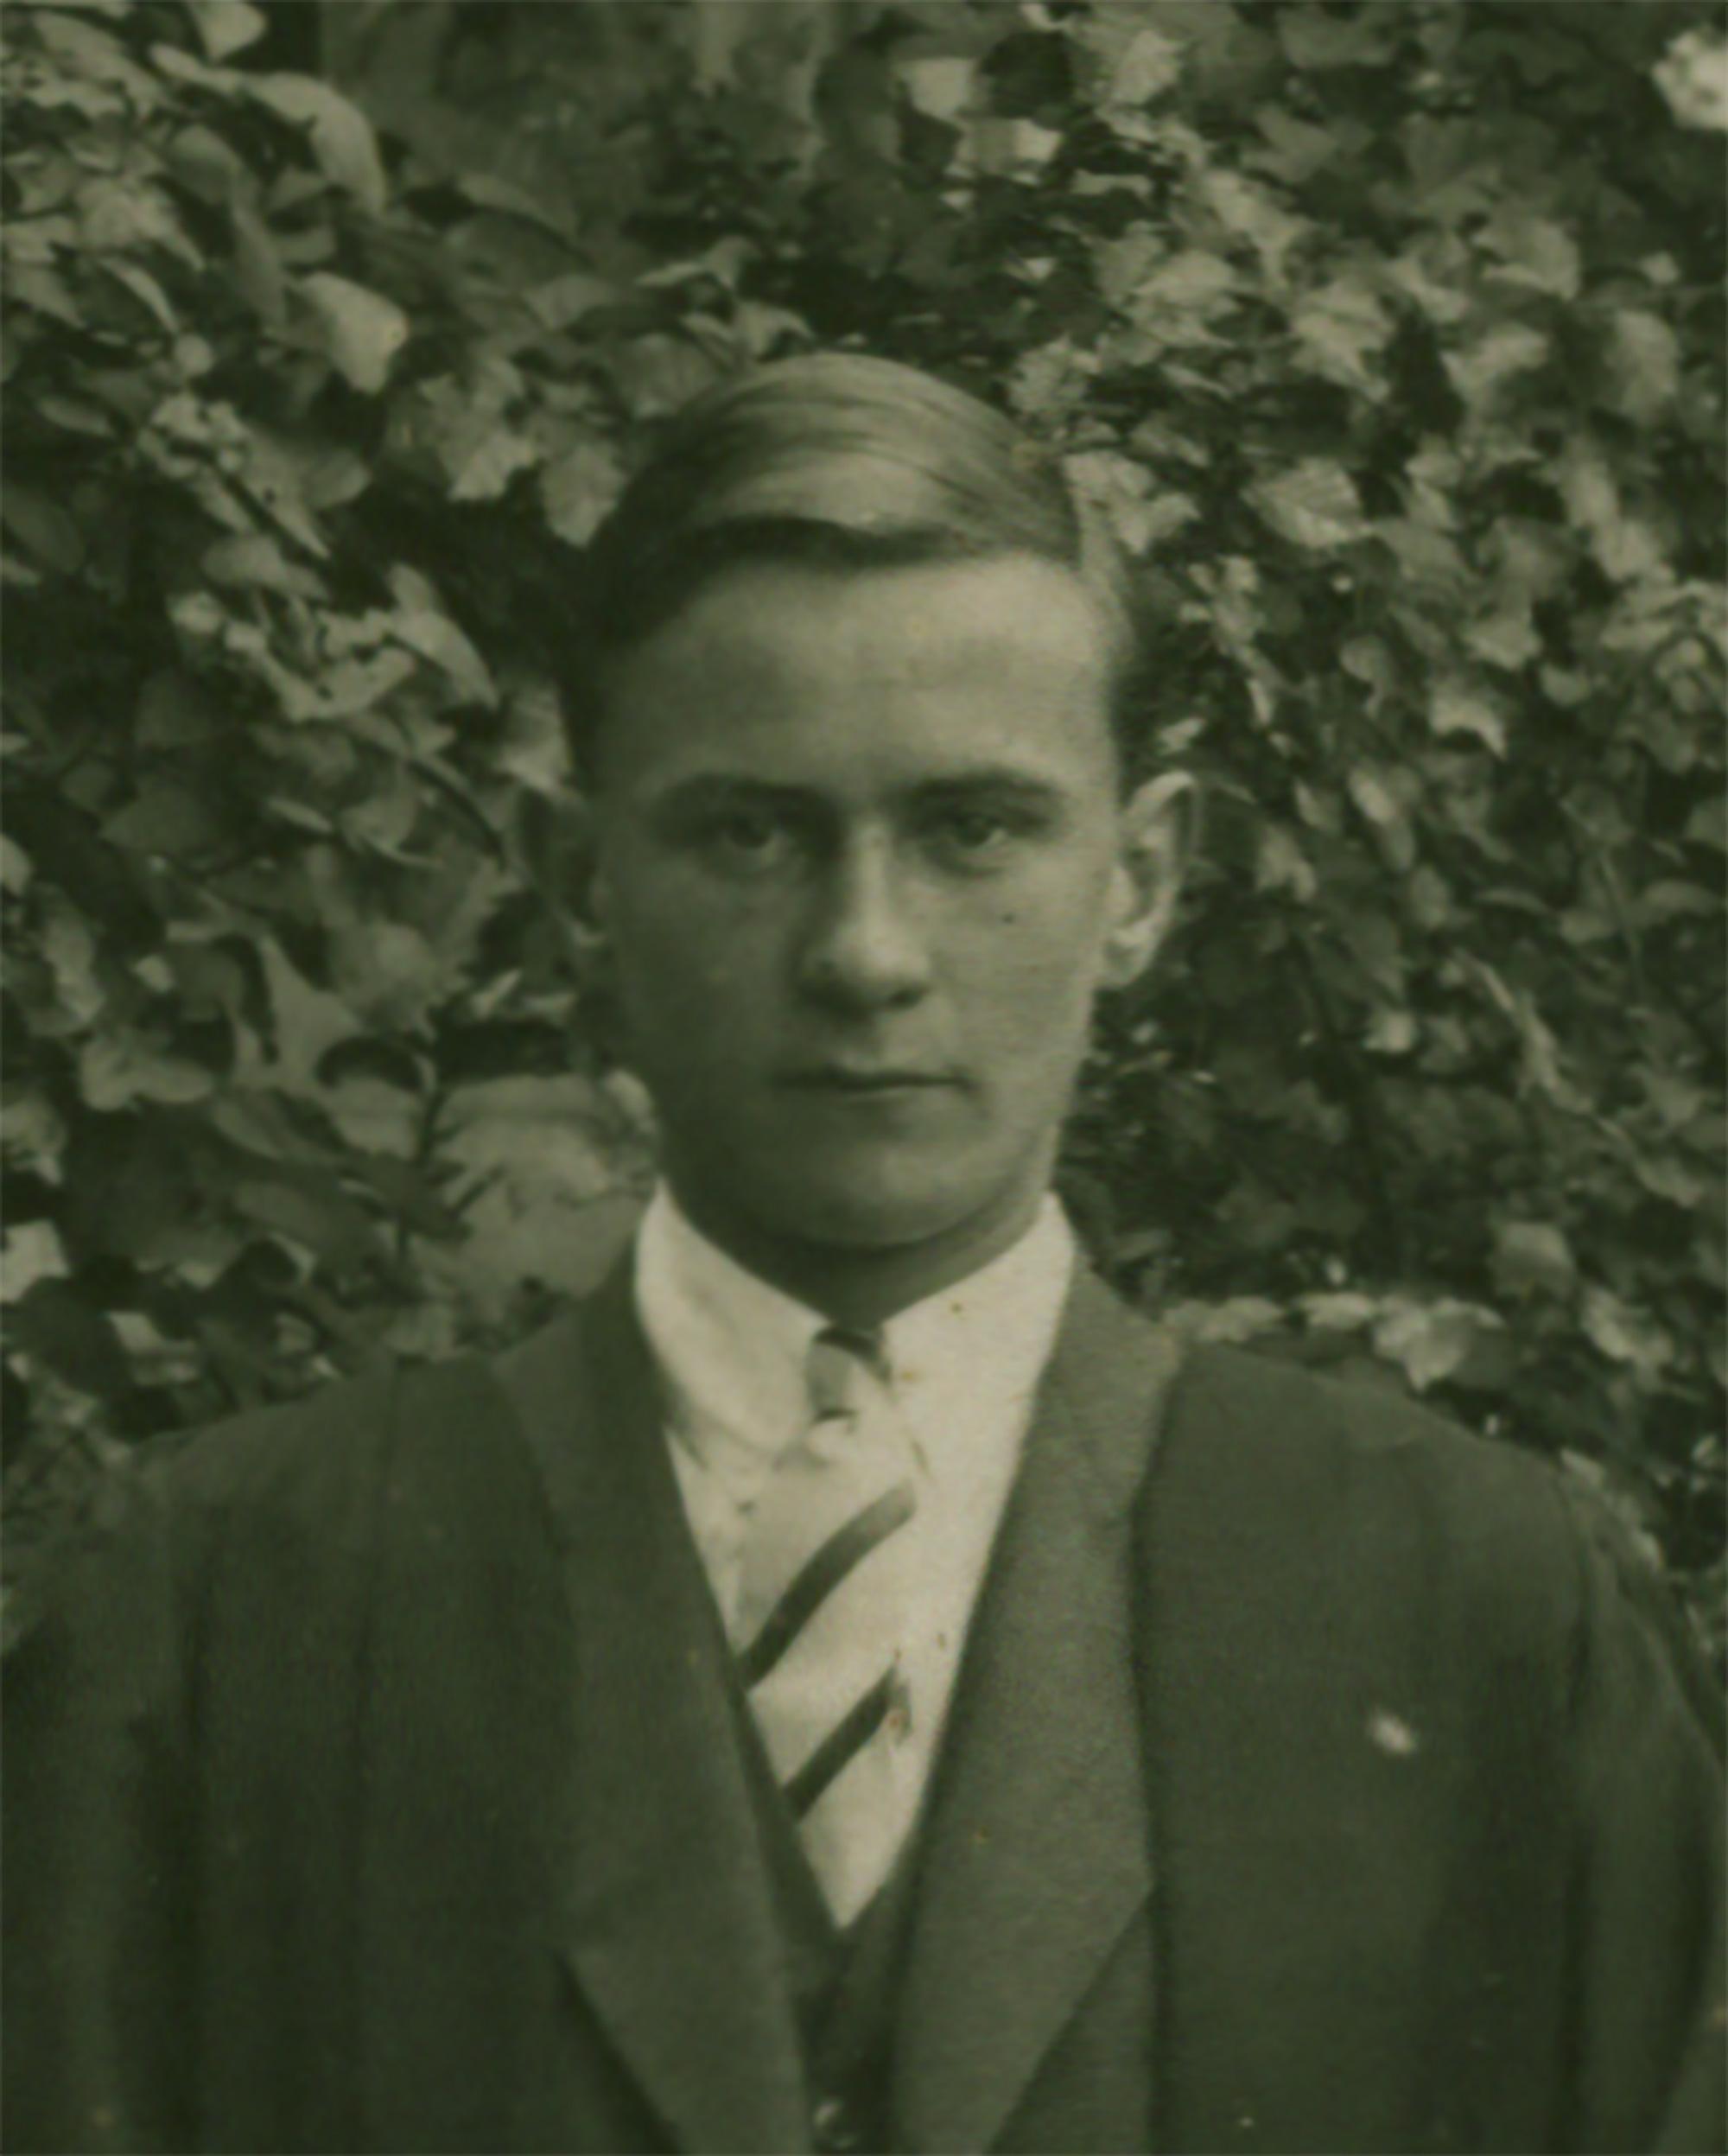 Portrait-Image-170---1945_12_08_fellowes_john_robert_lyon_prefects_1930_cropped-(cropped).jpg